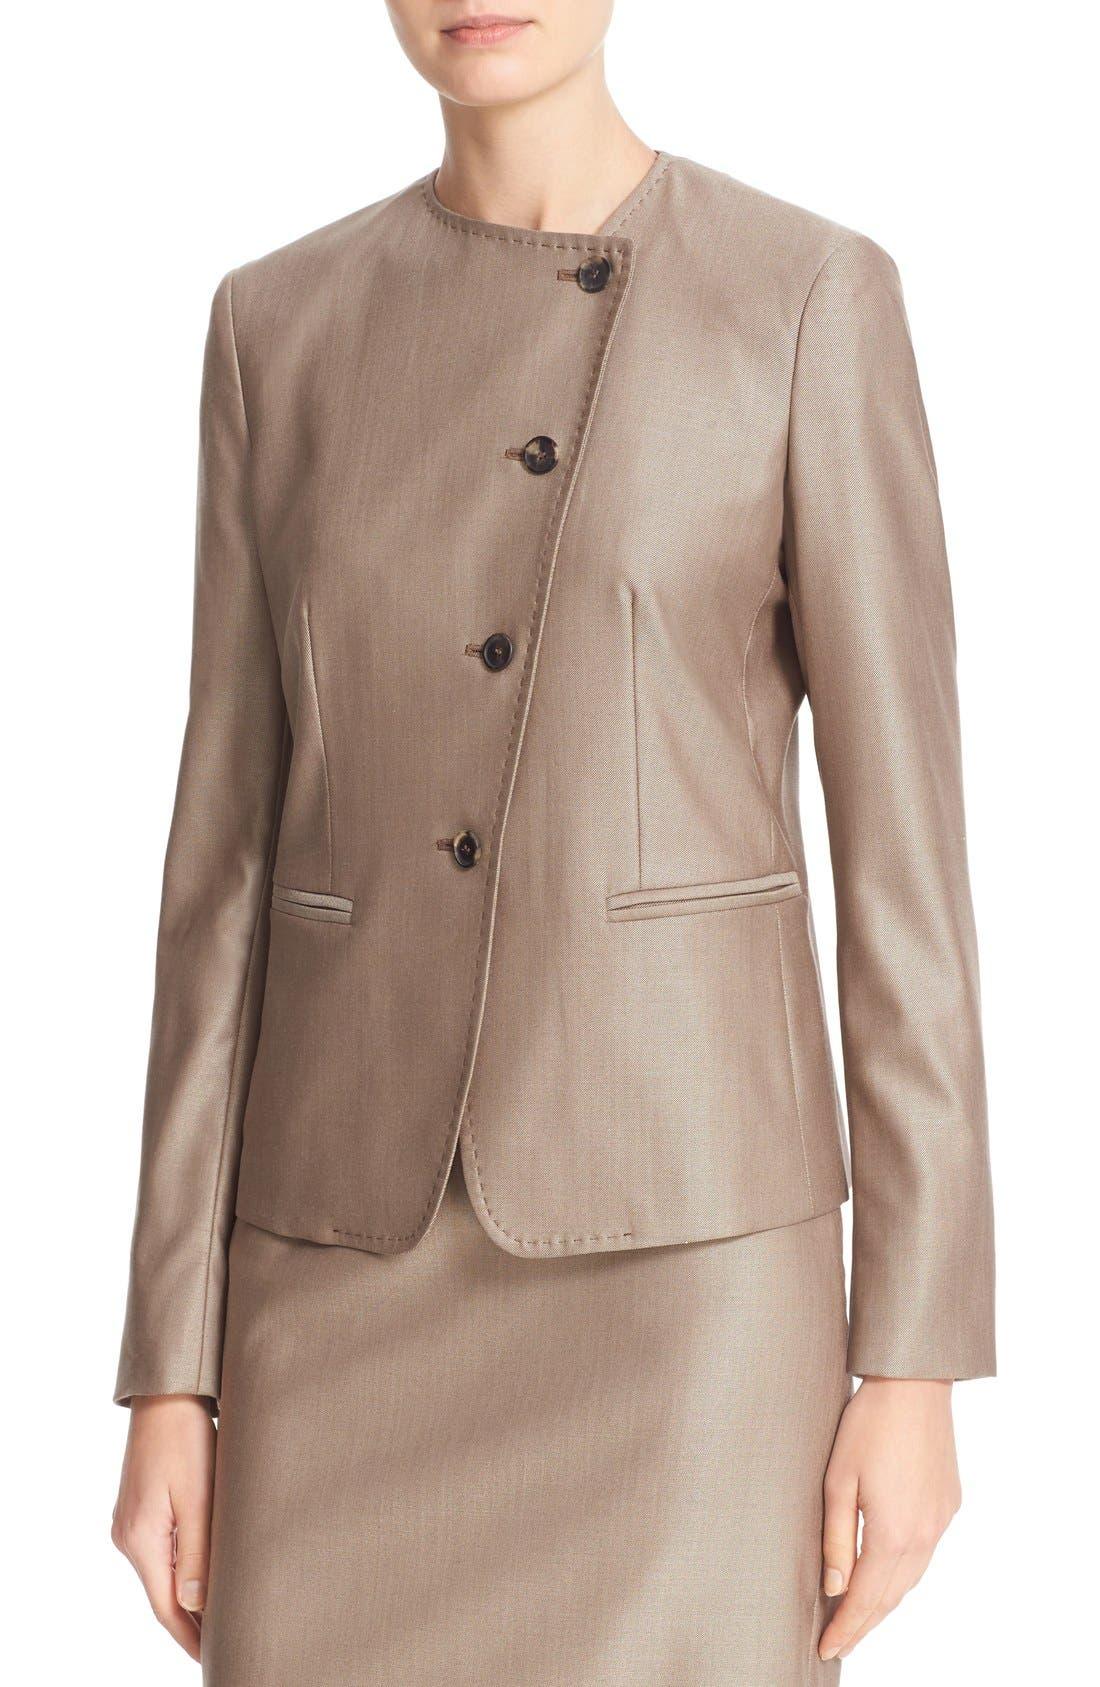 Erba Asymmetrical Jacket,                             Alternate thumbnail 12, color,                             220